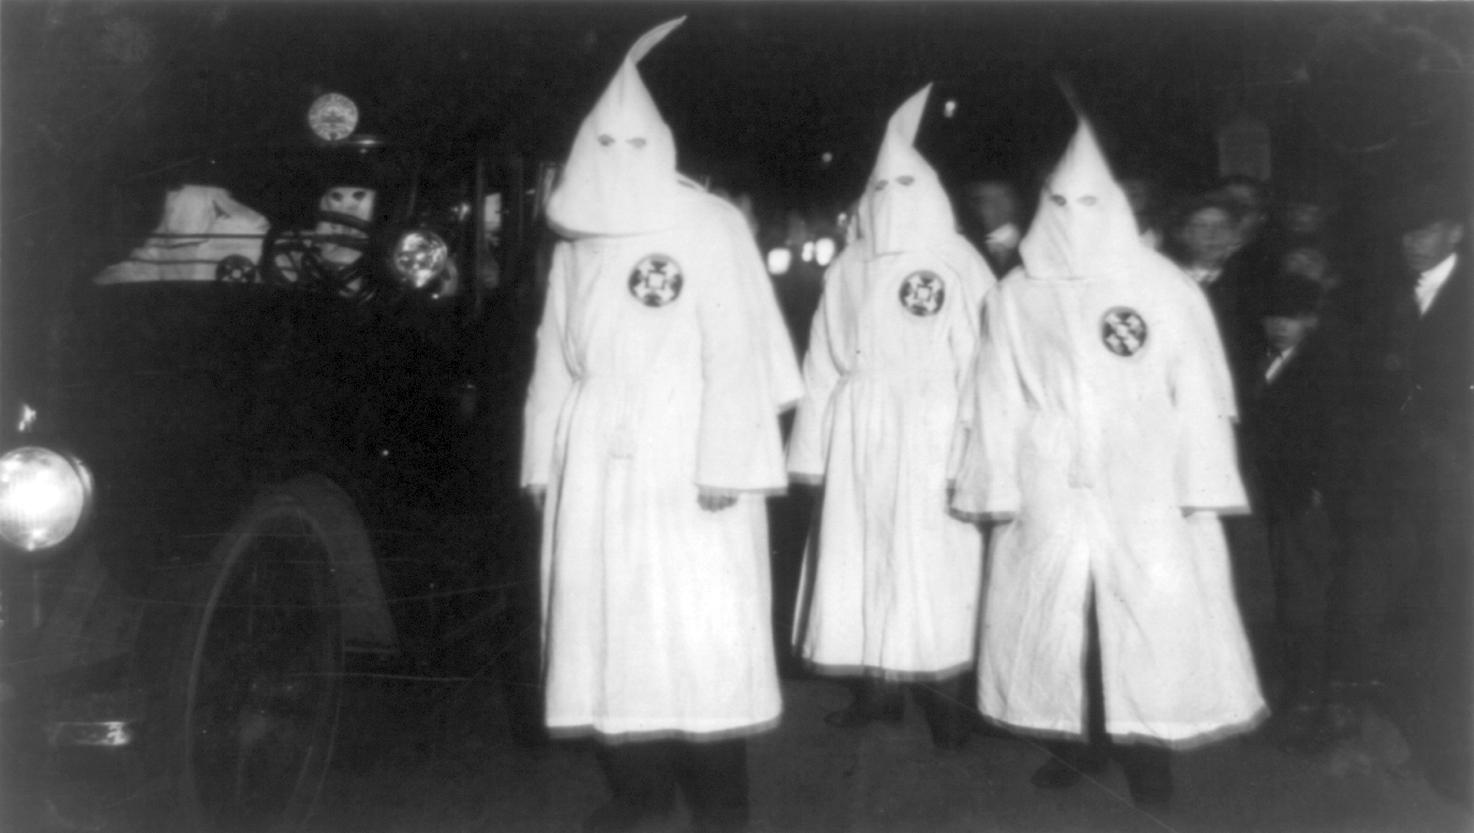 Ku_Klux_Klan1922TrumanYears